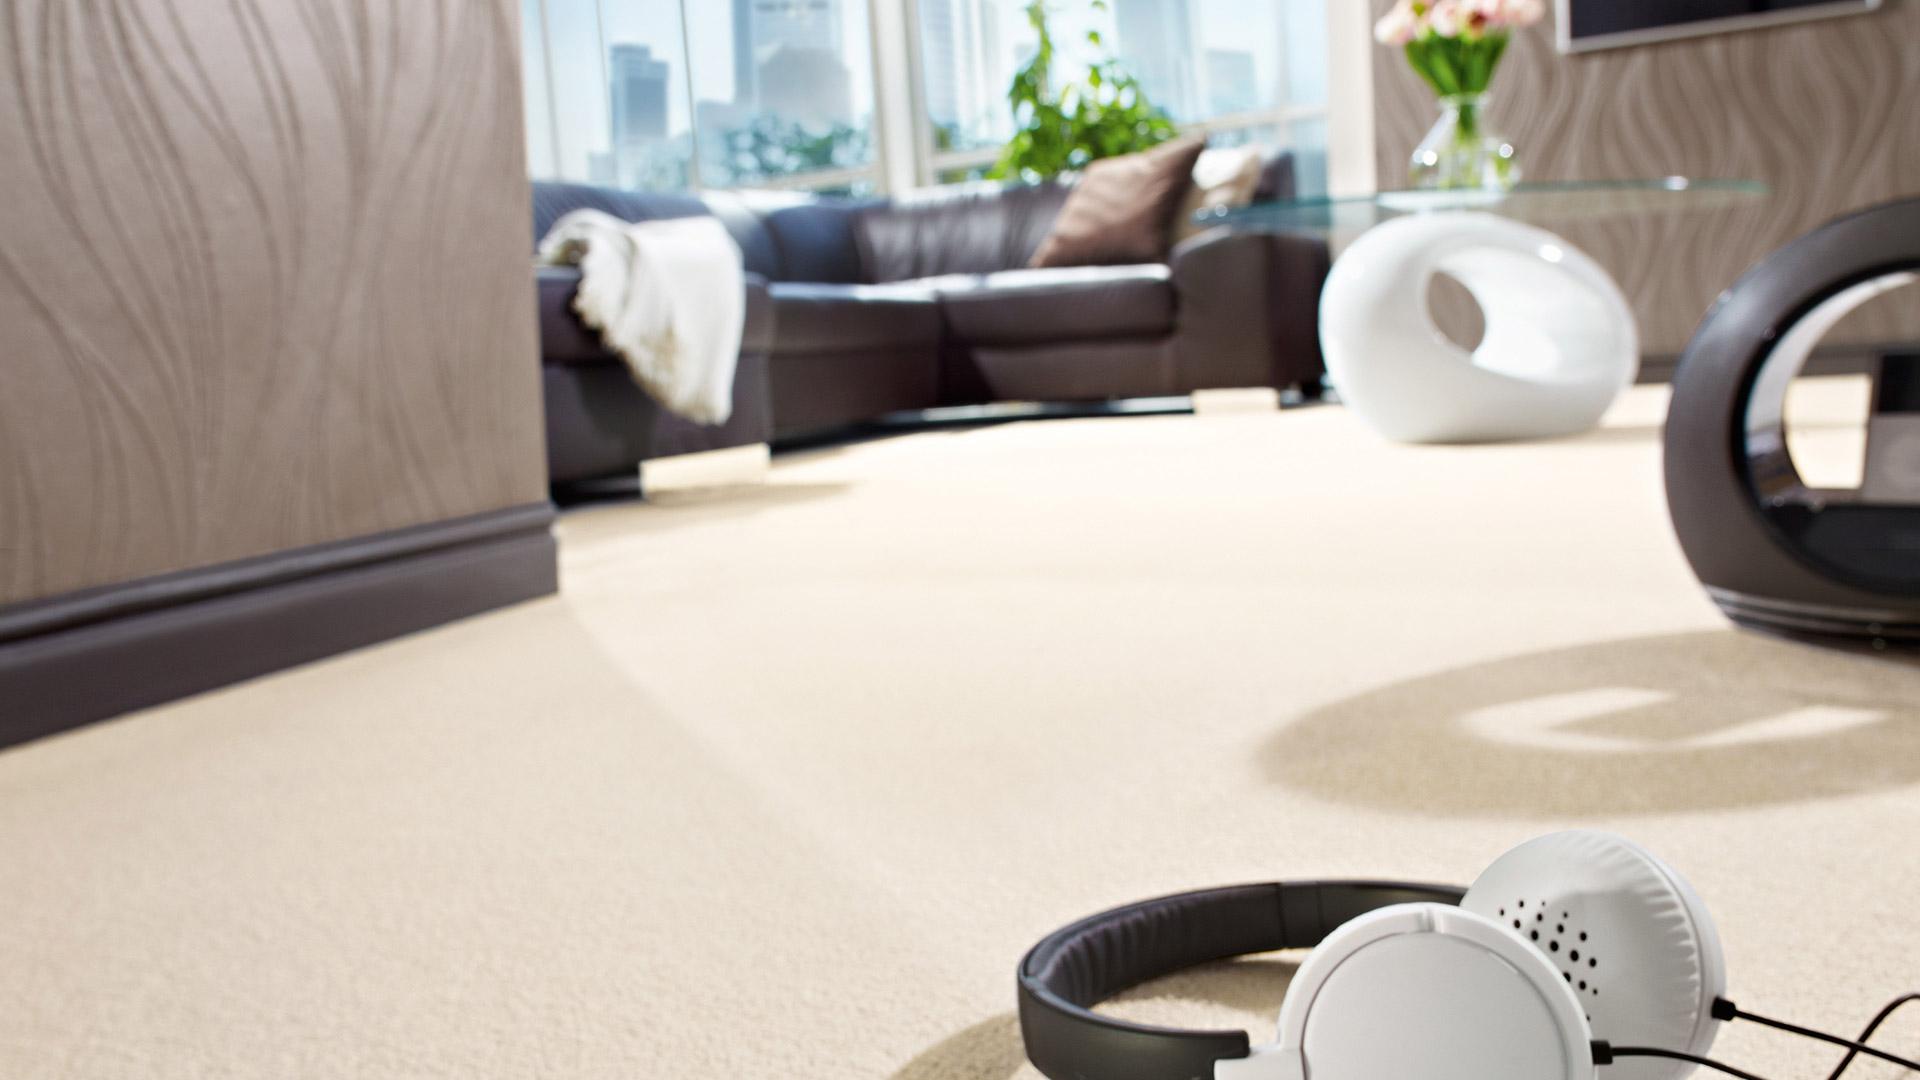 bernd tramp malermeister und raumdesigner in hude. Black Bedroom Furniture Sets. Home Design Ideas